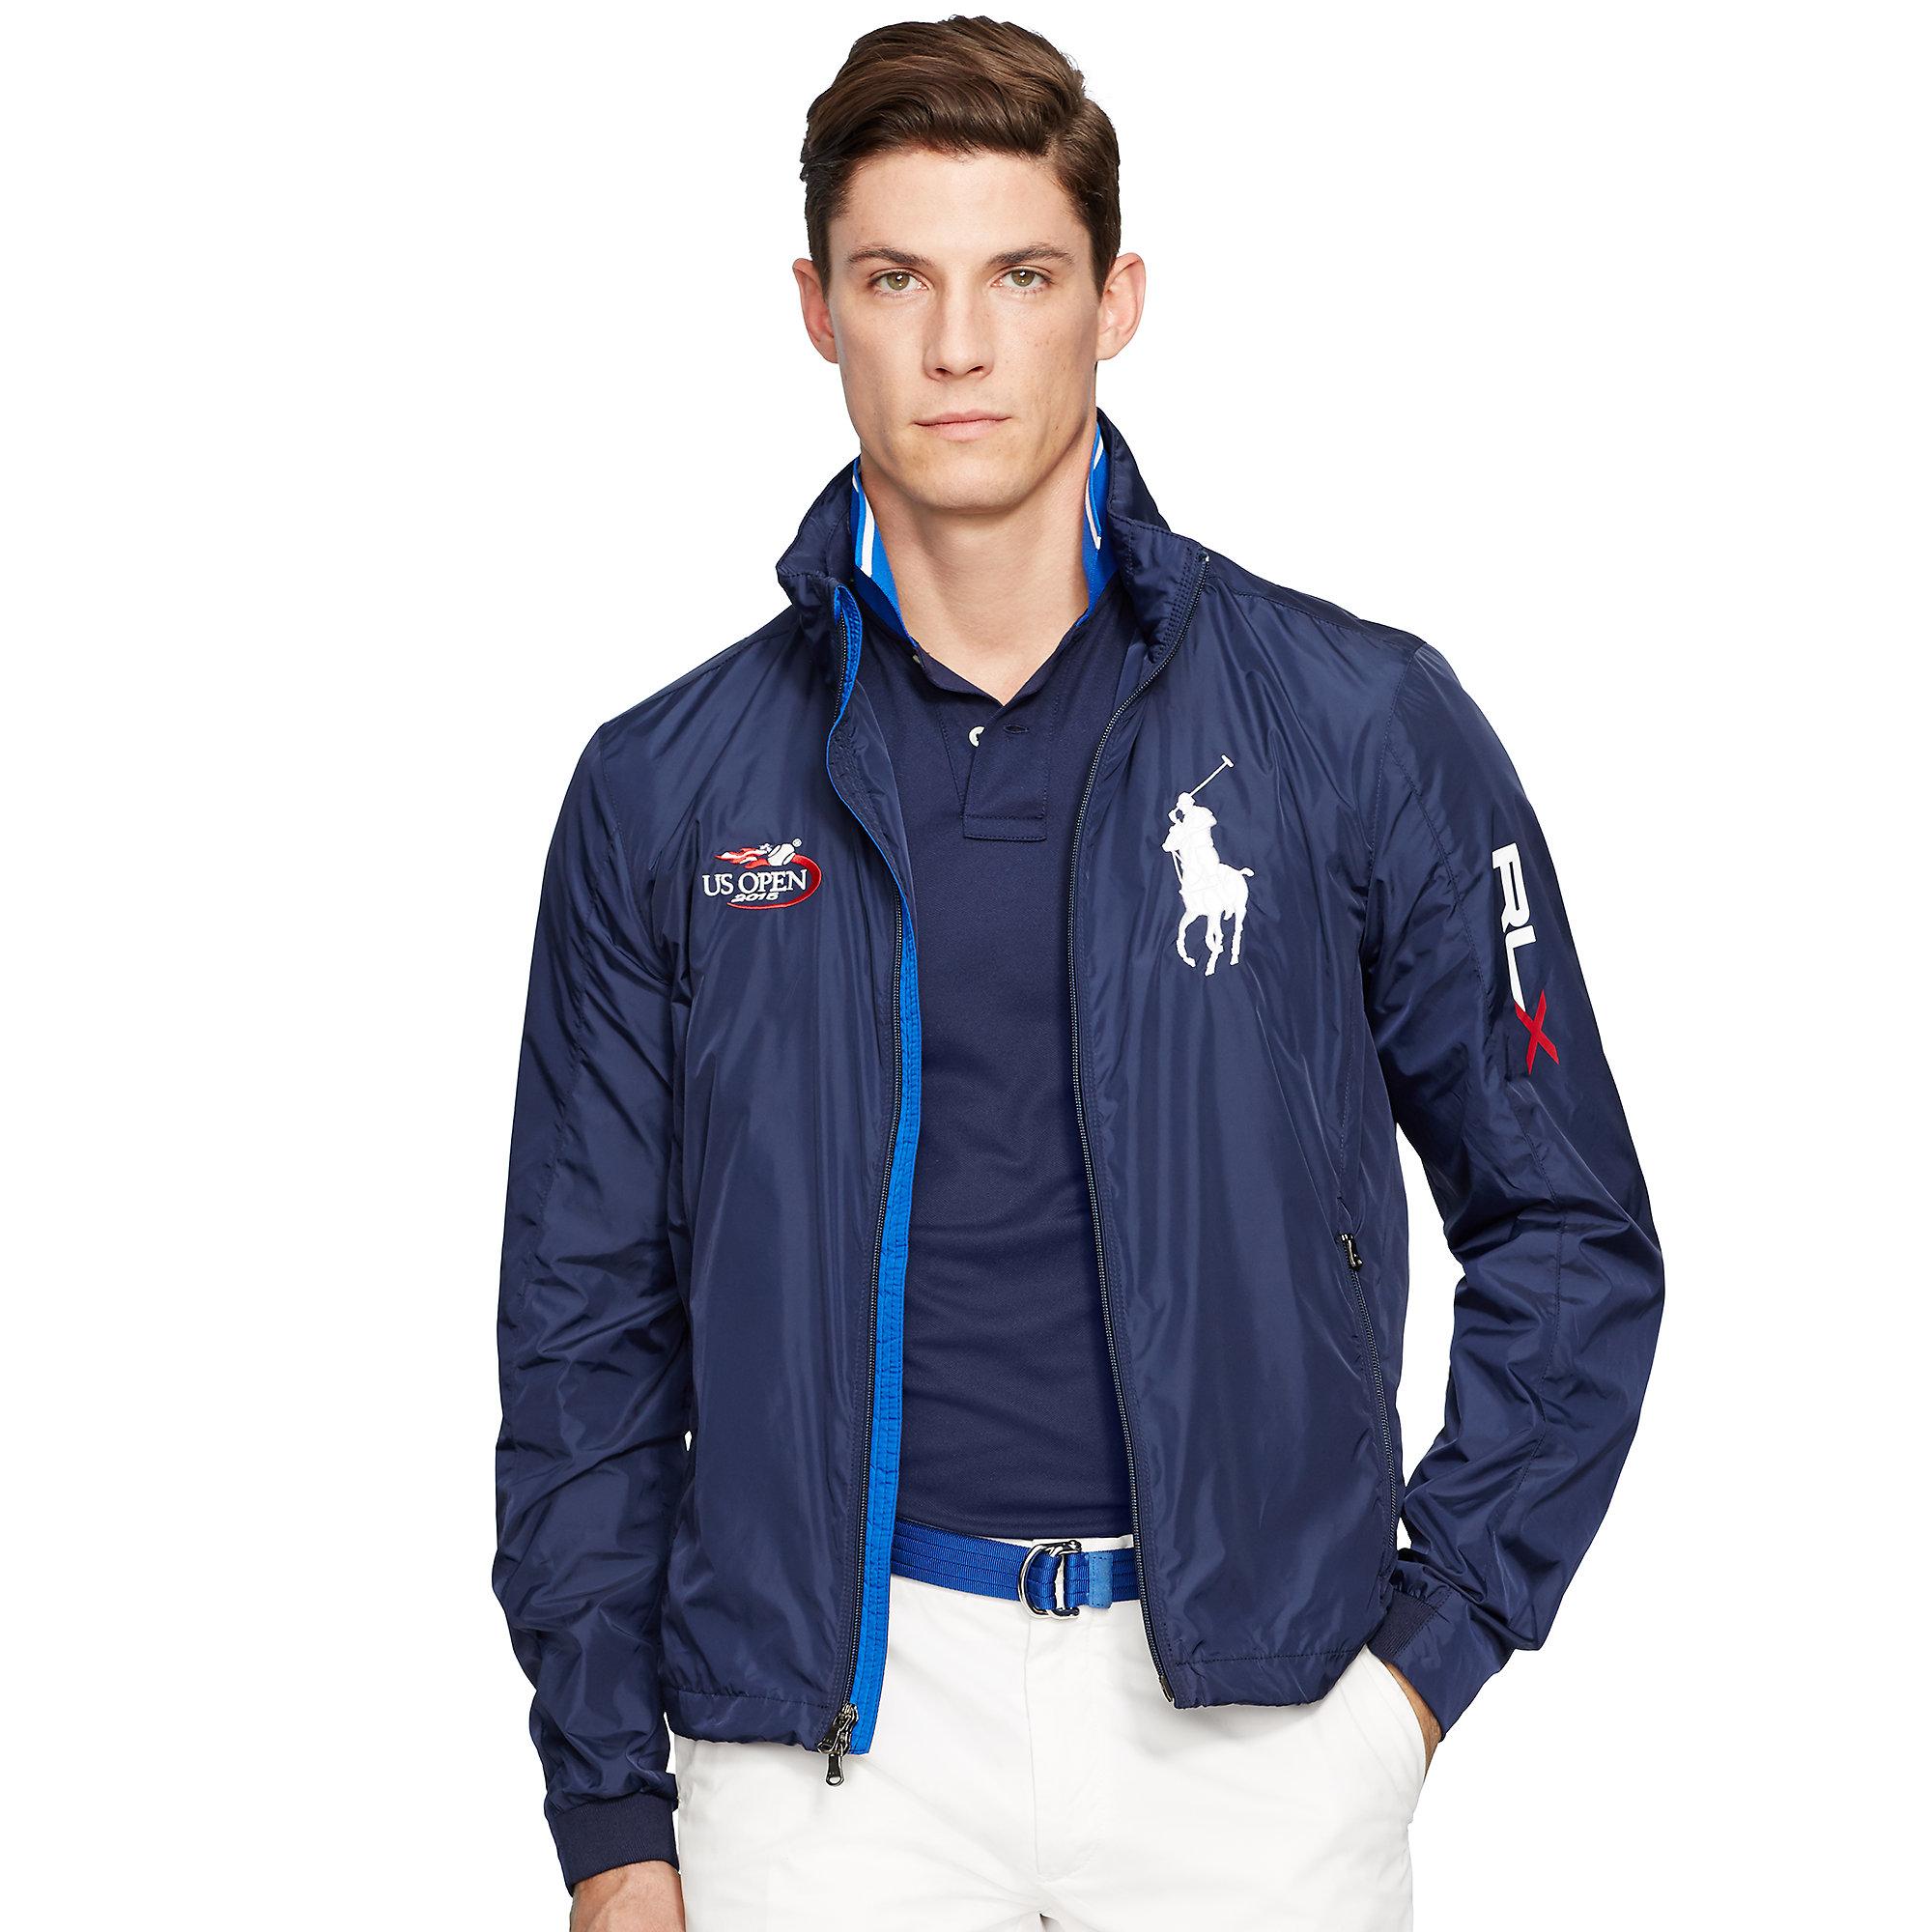 Us Men Blue Open Ralph Lauren Jacket Linesman For BshQrotCxd